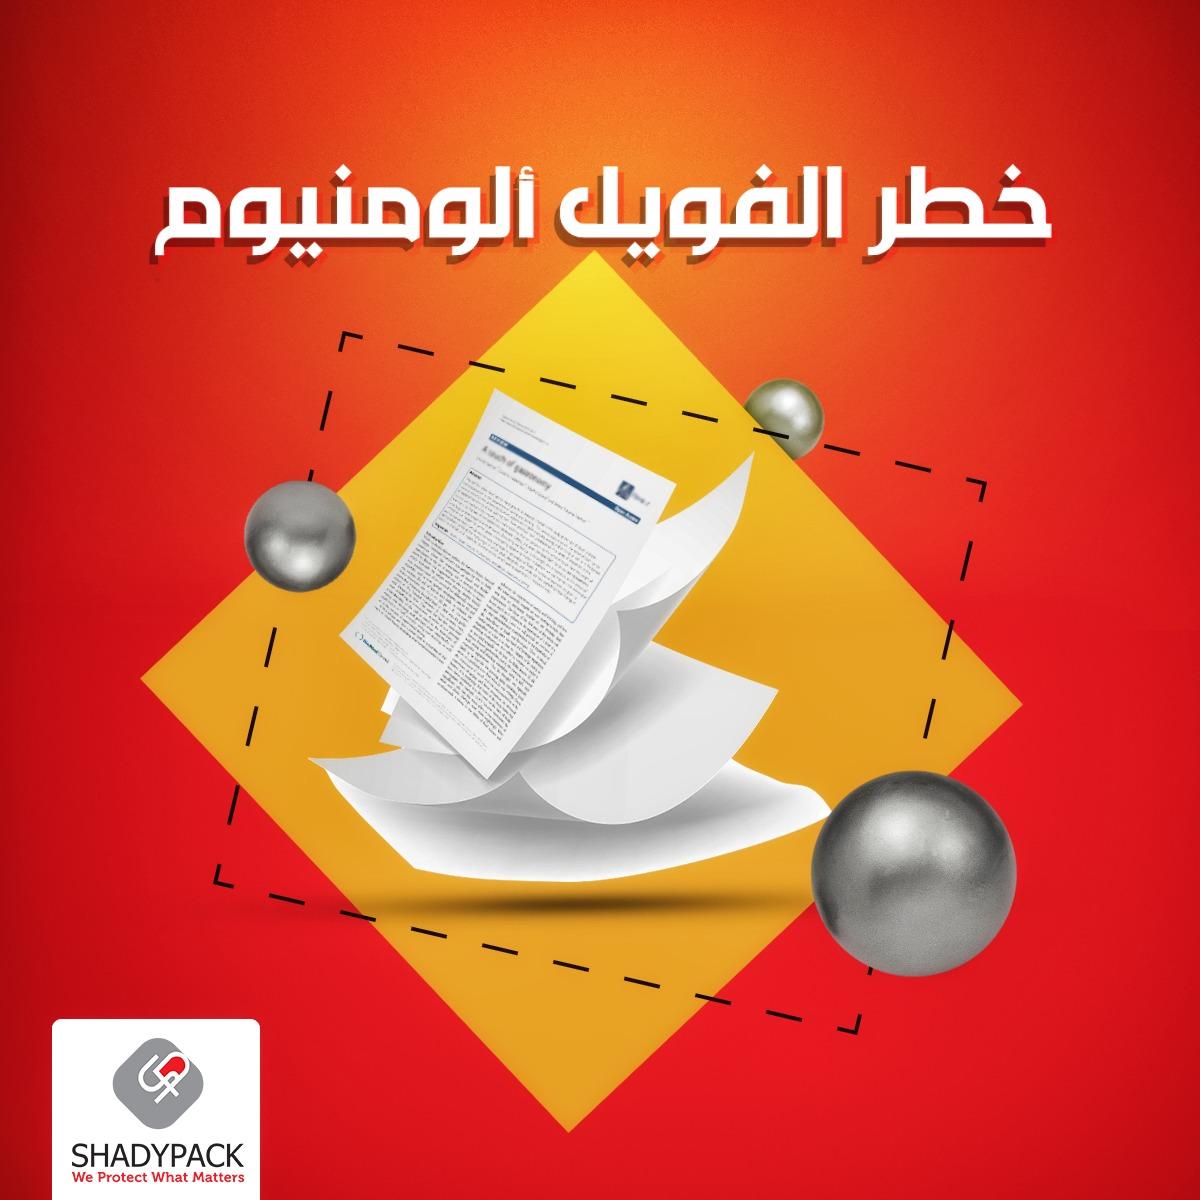 WhatsApp Image 2020 07 05 at 12.54.41 AM - Lead Marketing & PR Agency